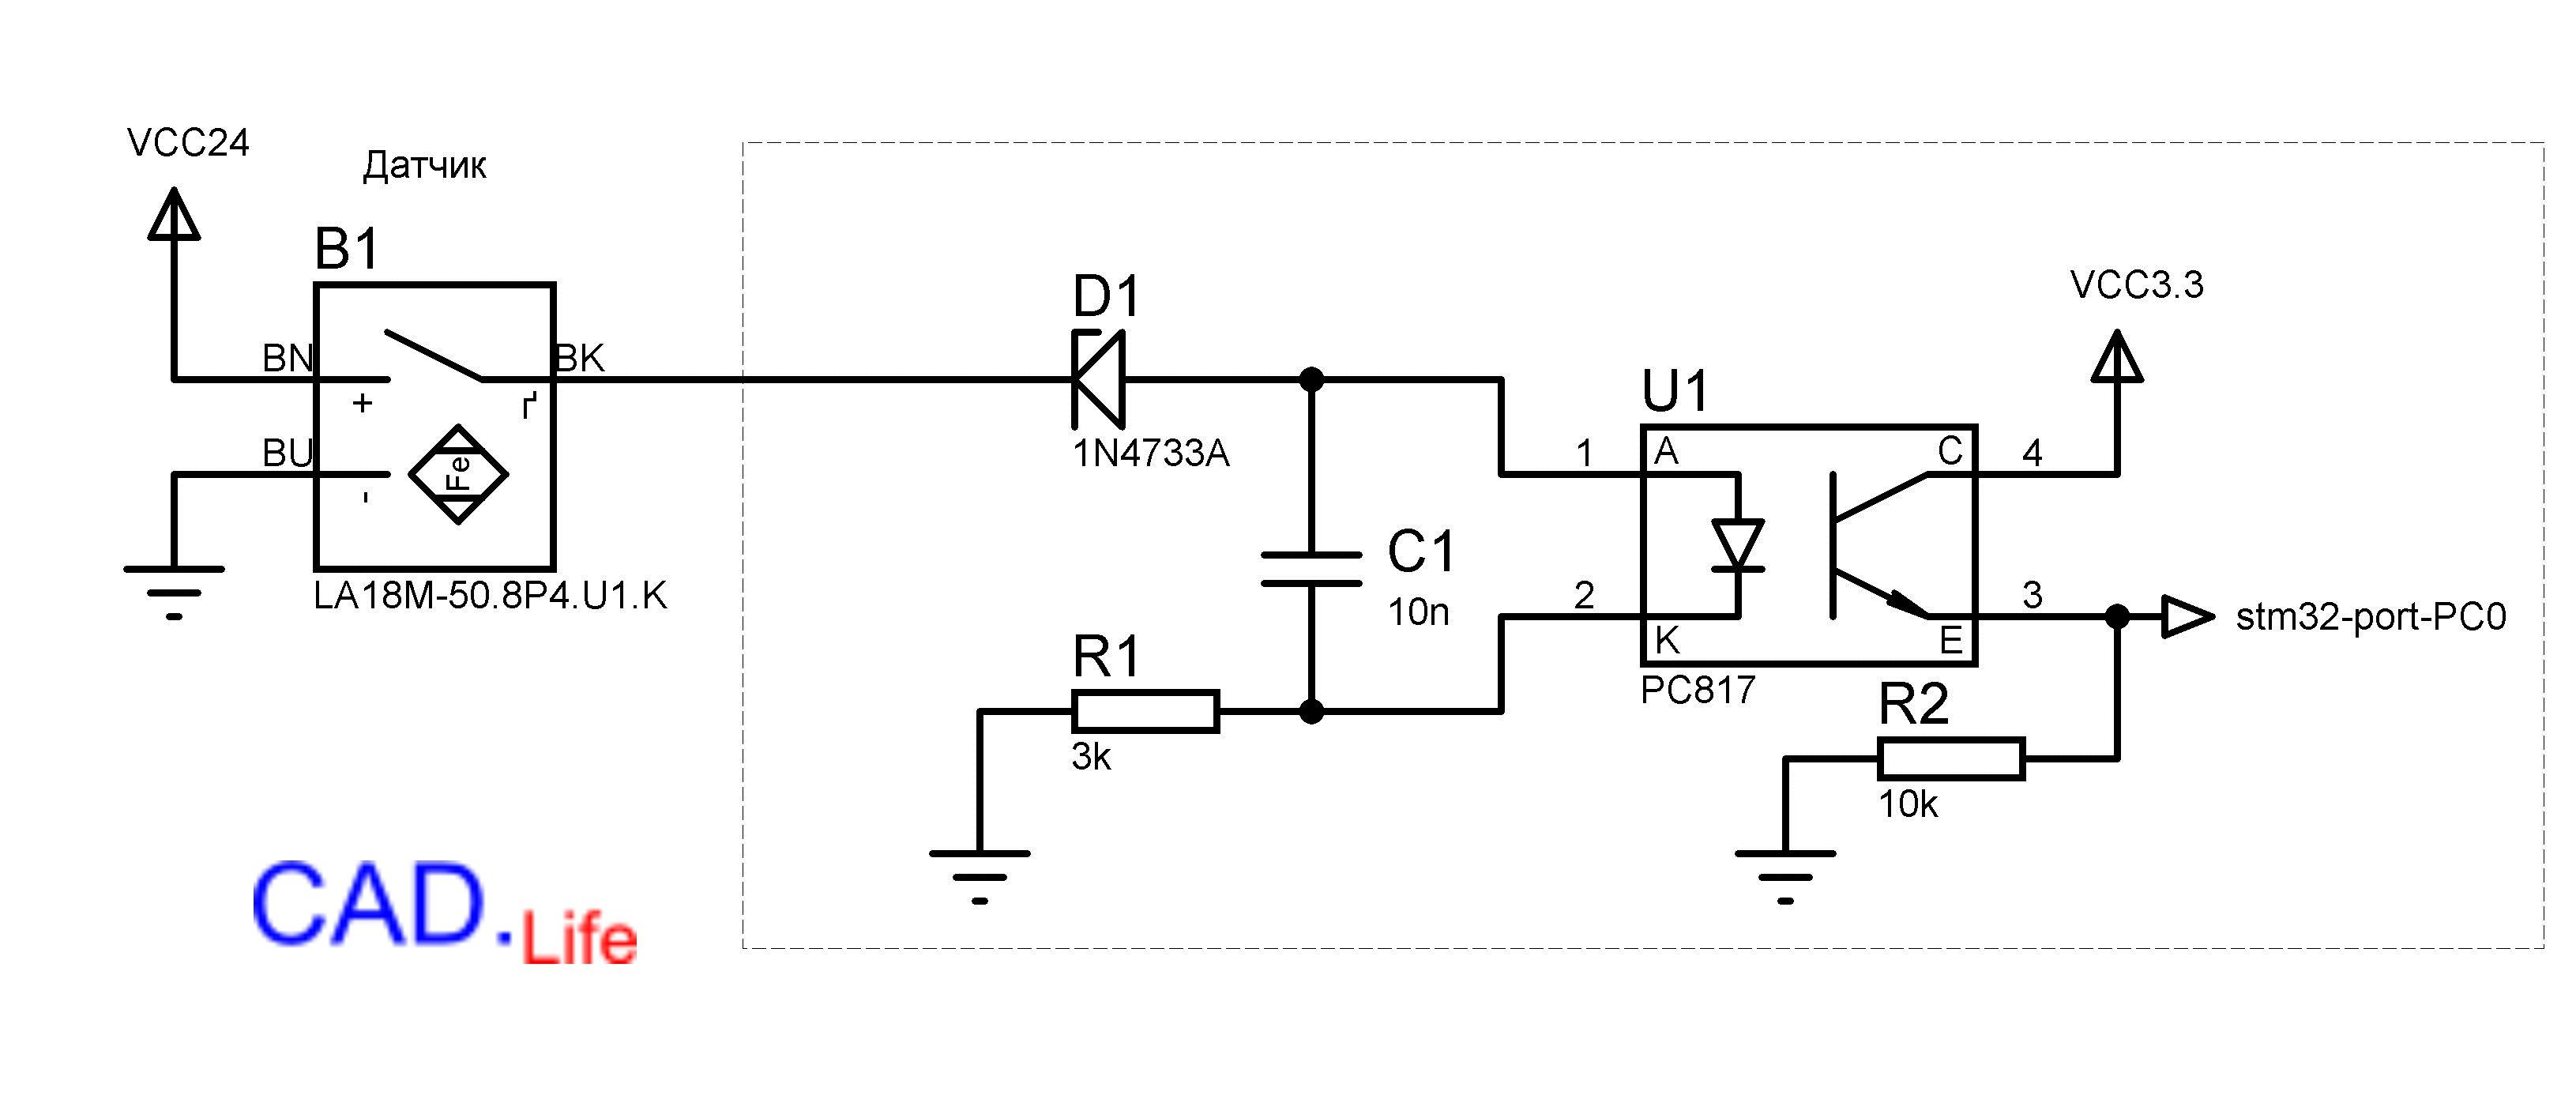 Рис.3. Не инвертирующая схемавключения датчика через оптрон